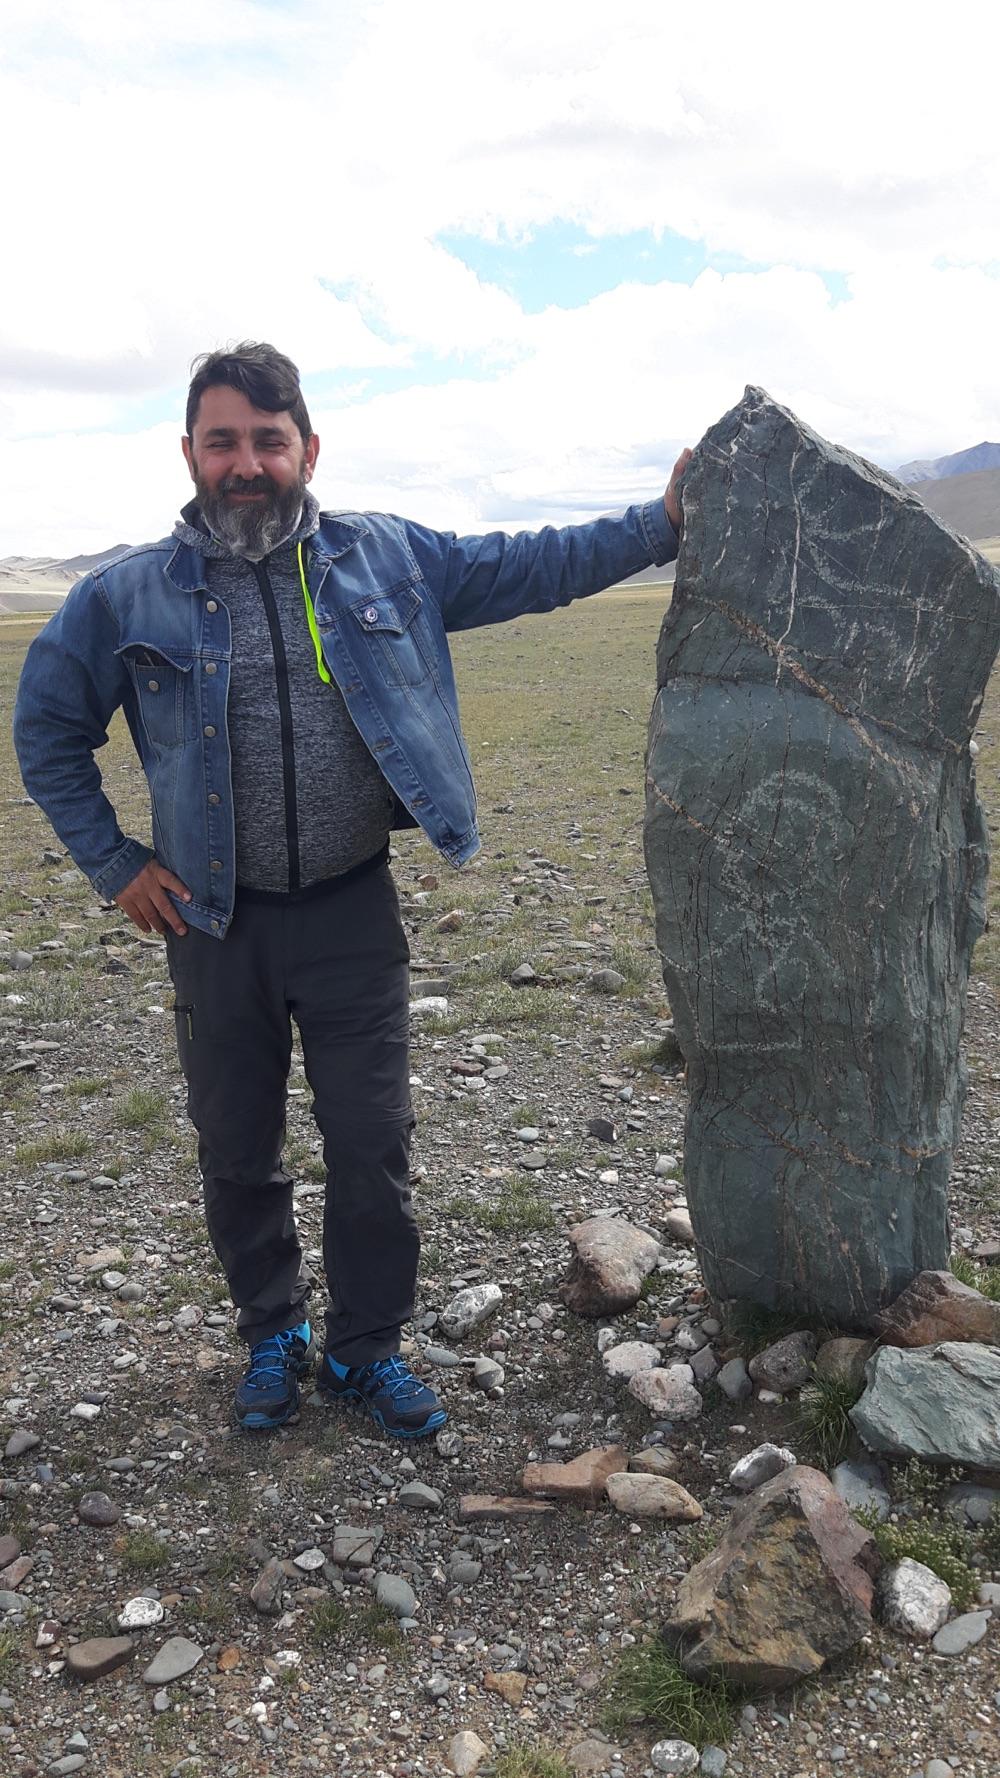 tankut_guzel_Mogolistan_Turkic_stone_man